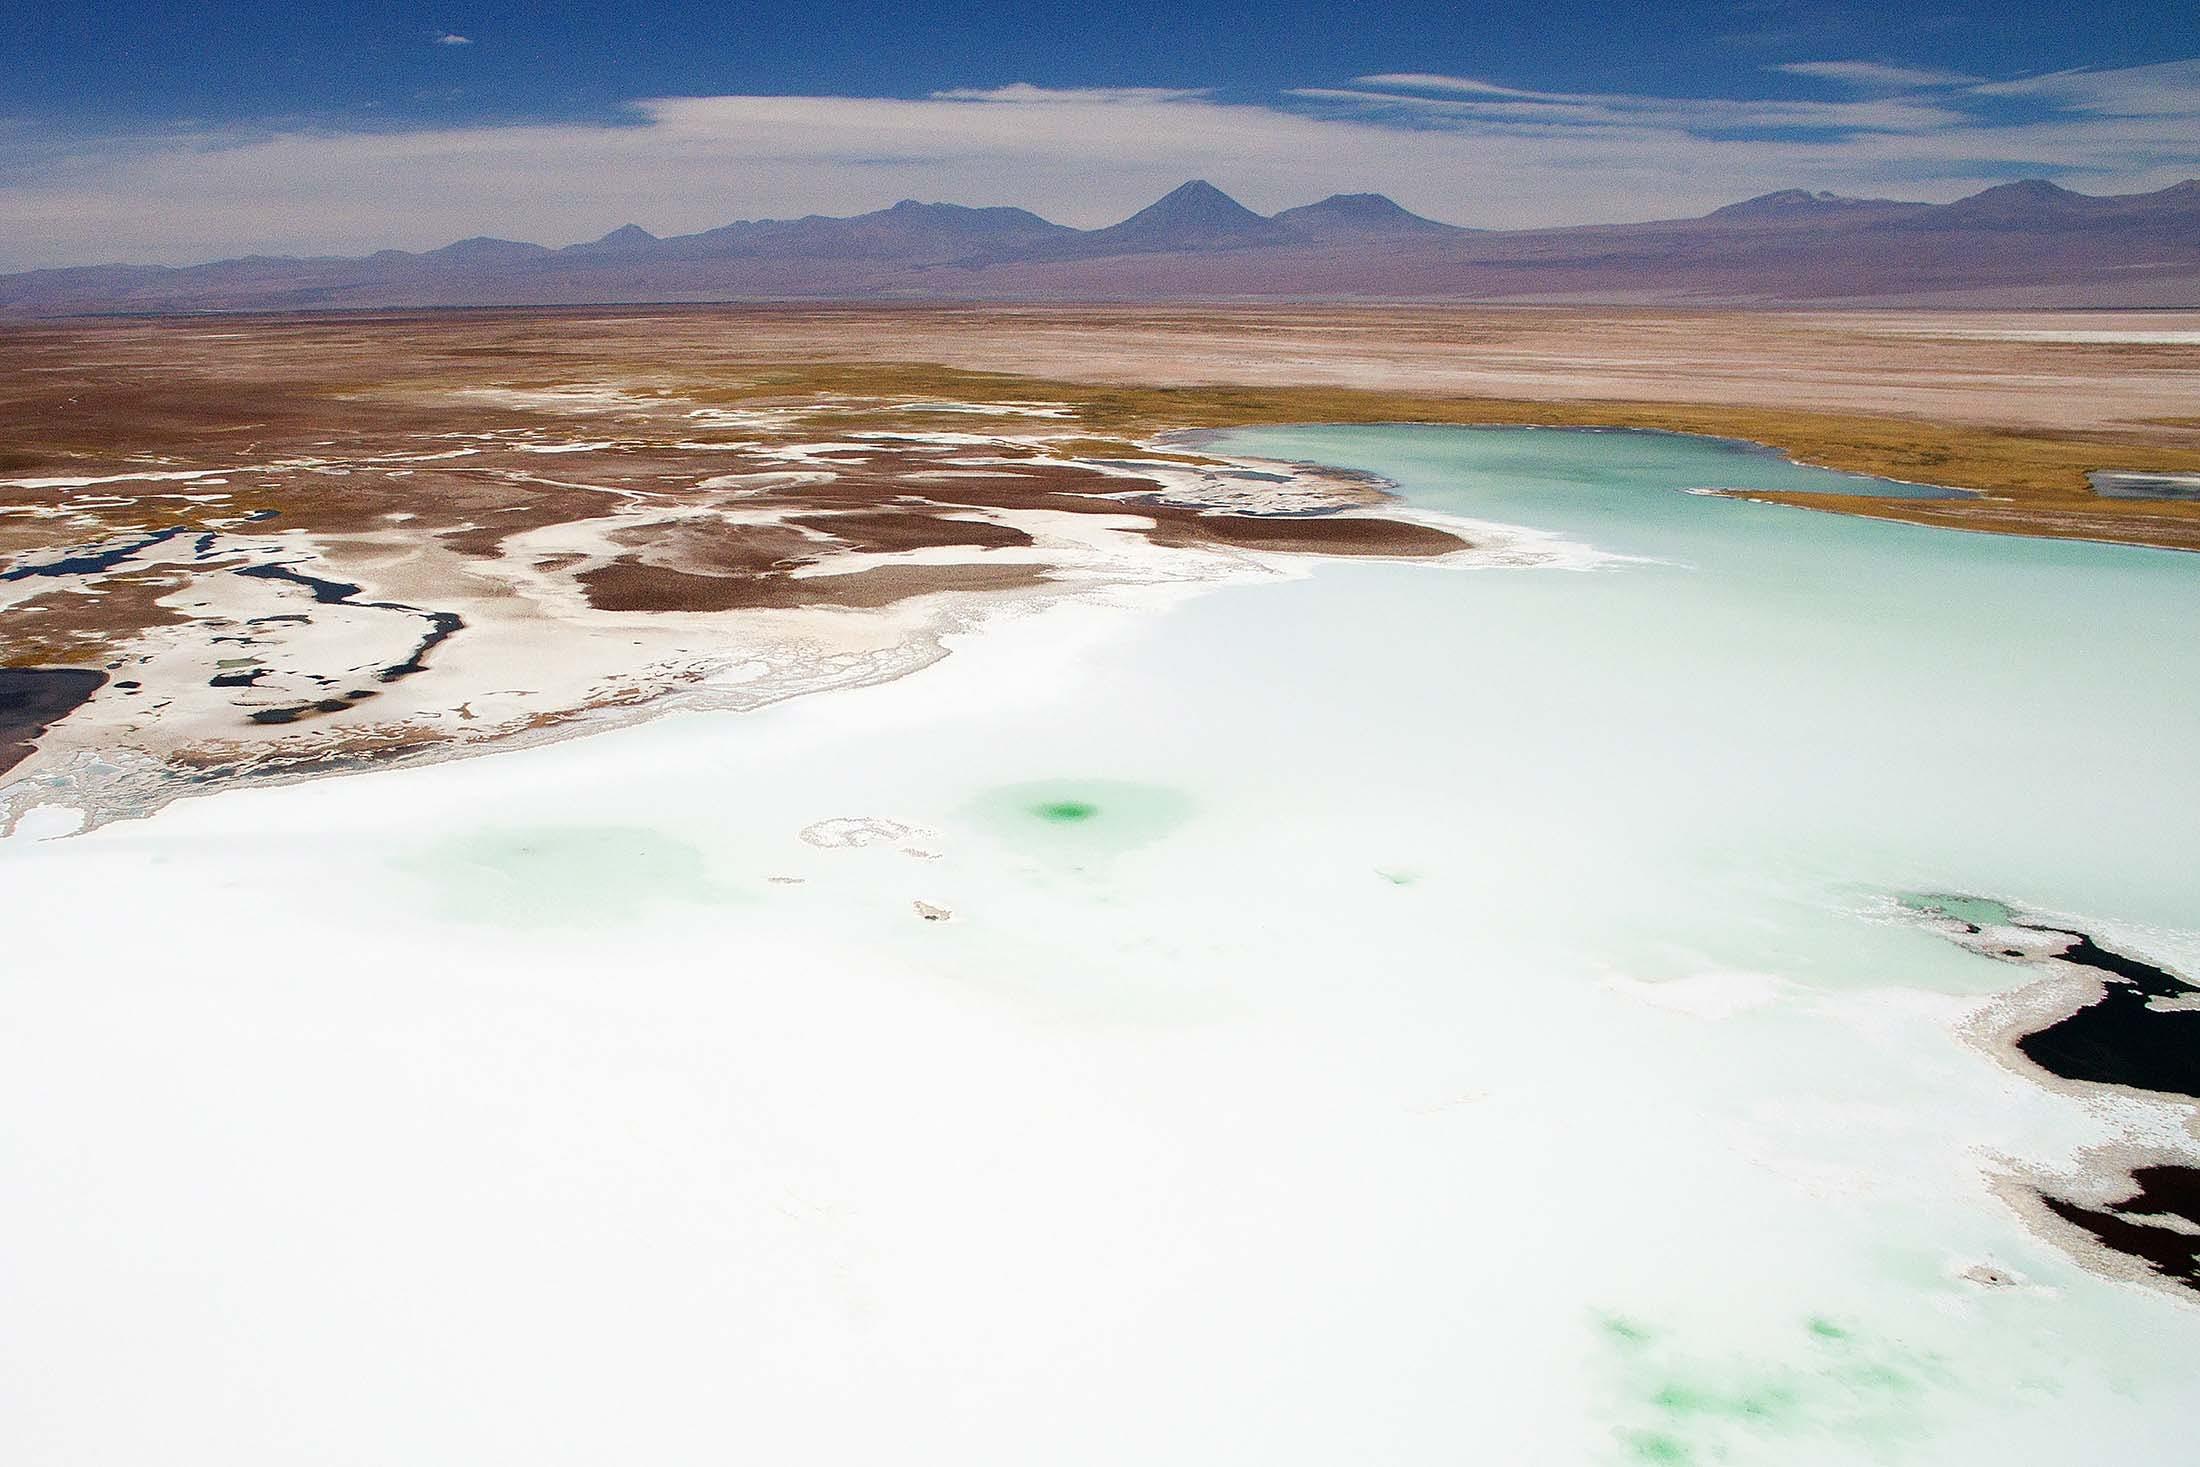 Chilean Flamingos - Atacama Salt Flats, Reserva National Los Flamencos, Antofagasta, chile